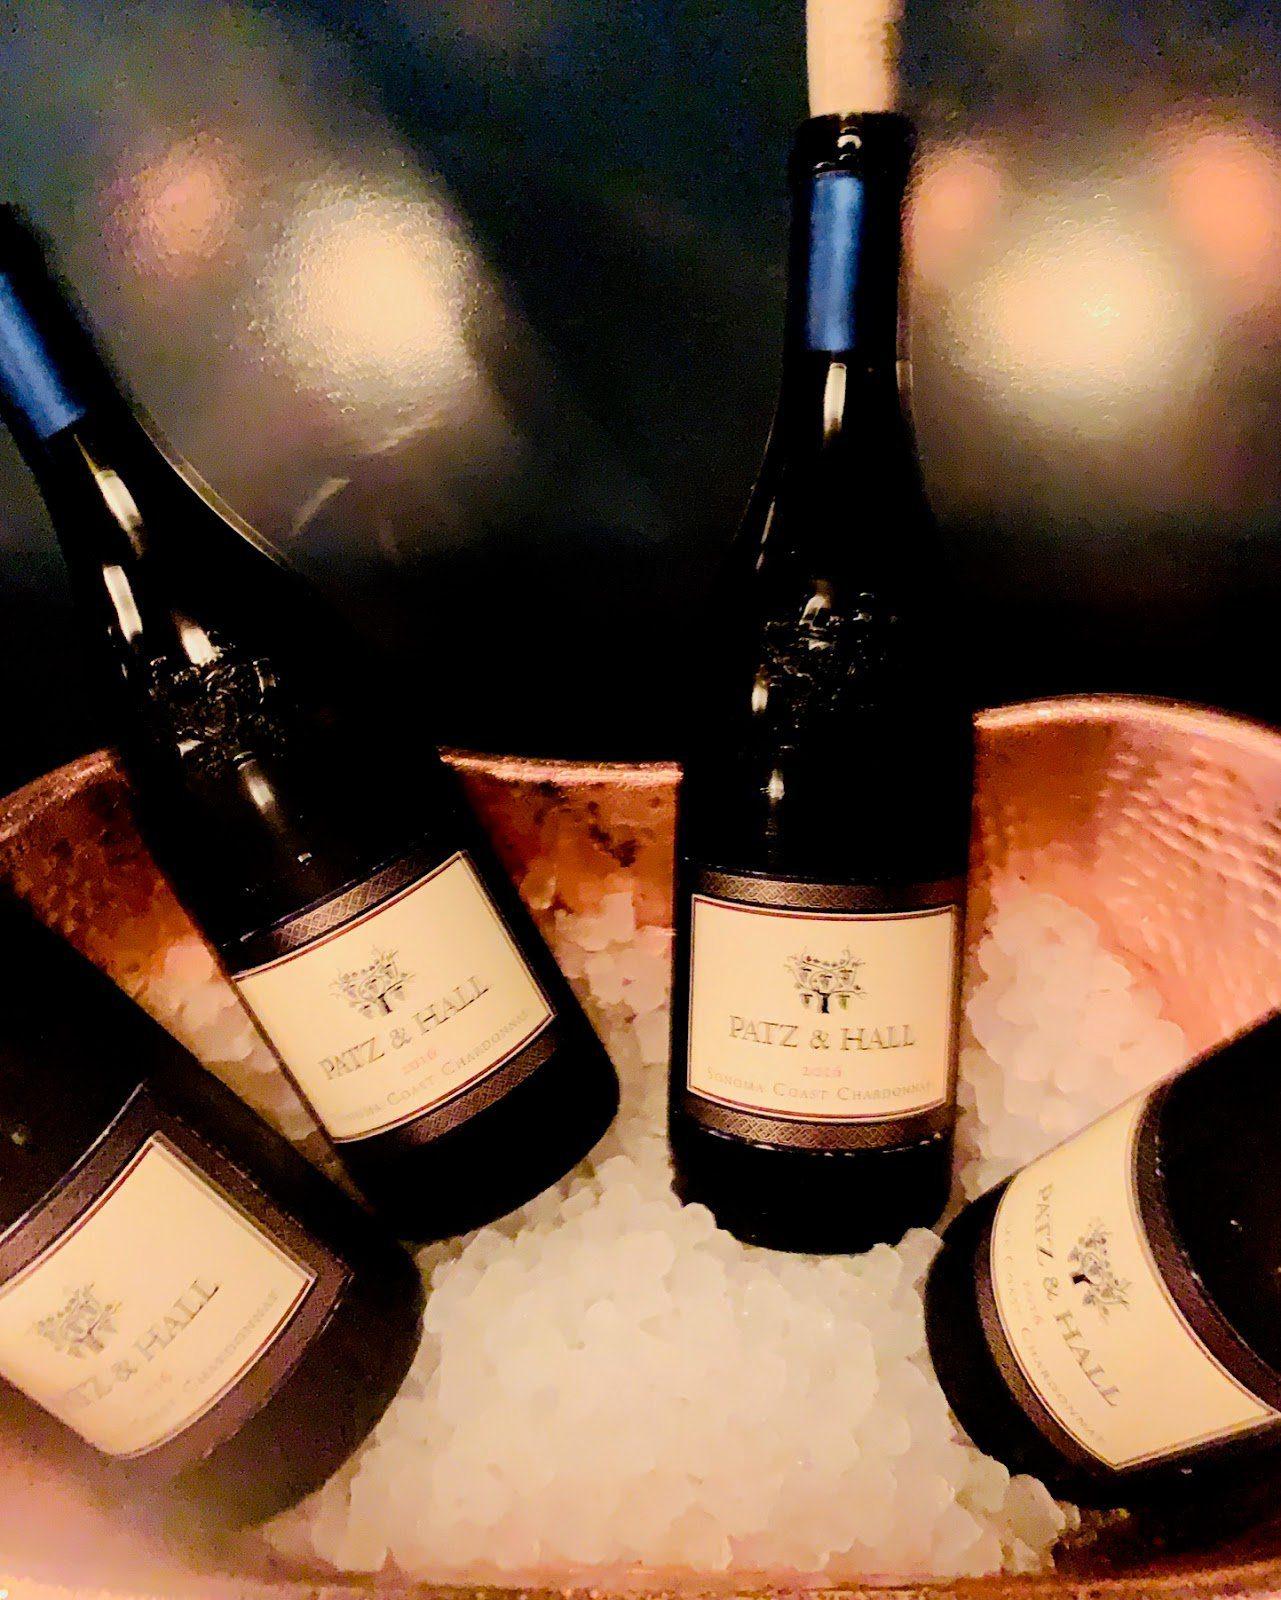 Sonoma Wine Country: Patz & Hall Chardonnay Sonoma Coast 2016